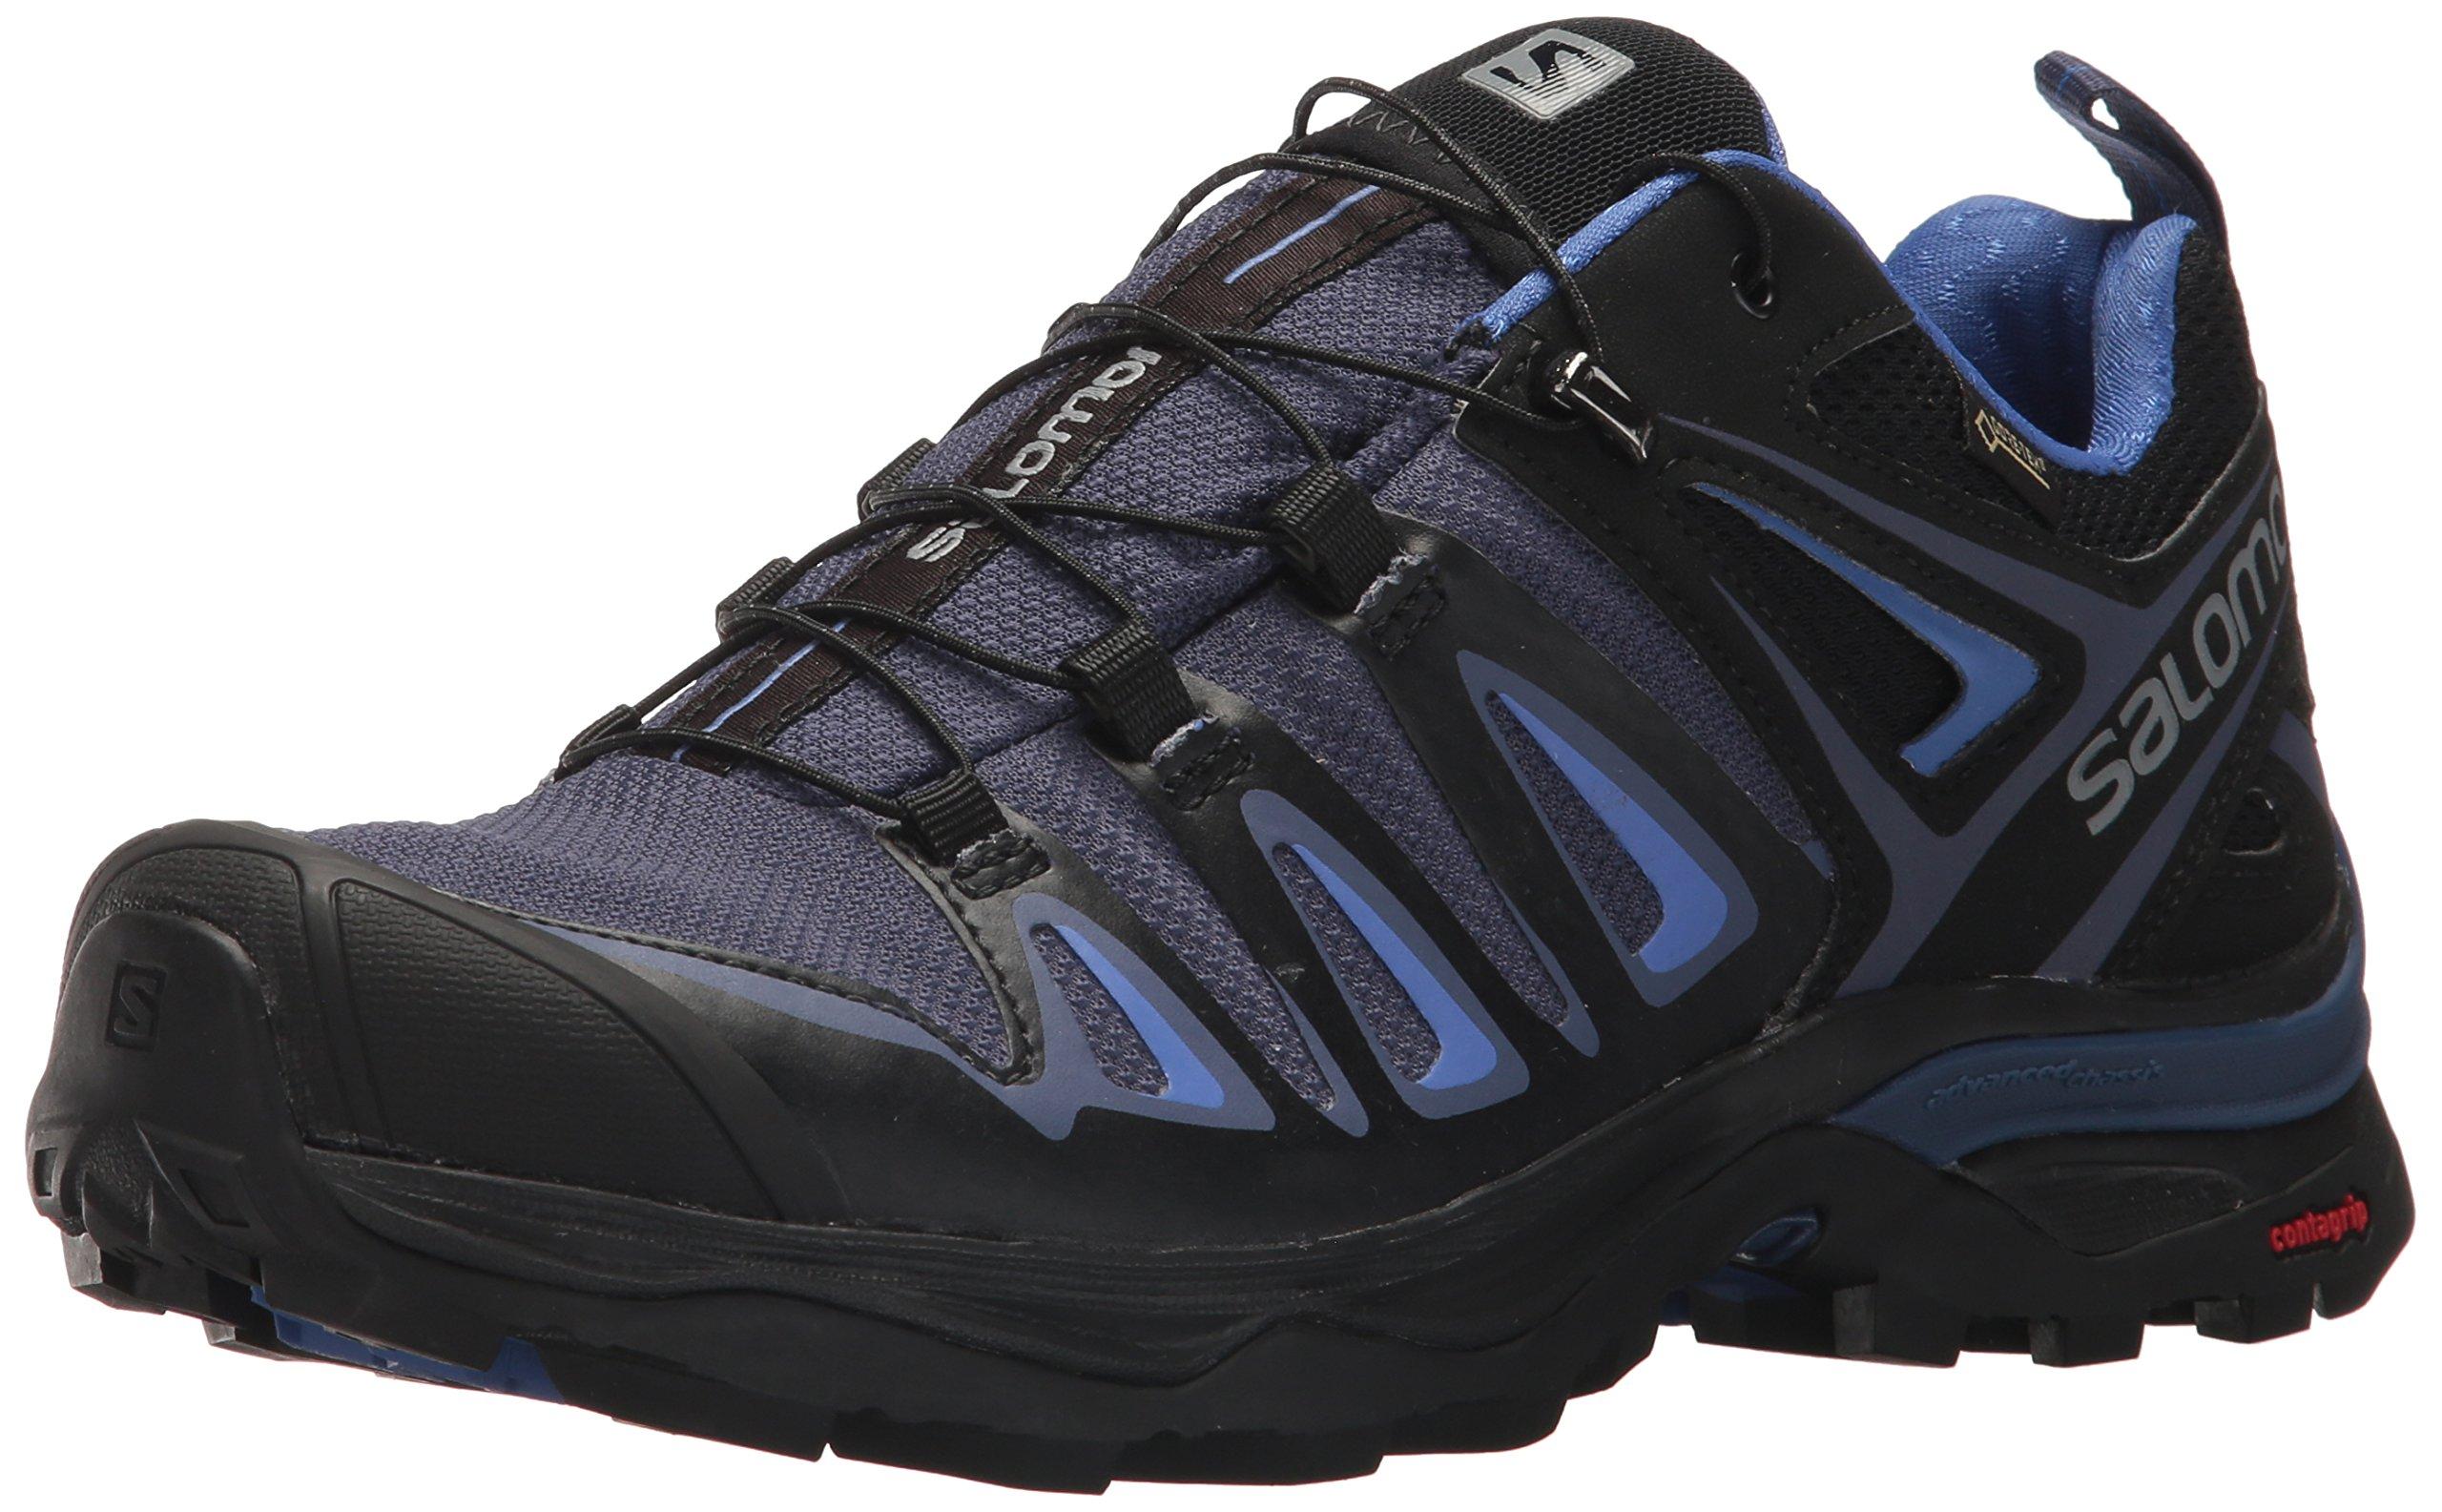 16e337a8718 Salomon Women's X Ultra 3 GTX Hiking Shoes < Trail Running ...